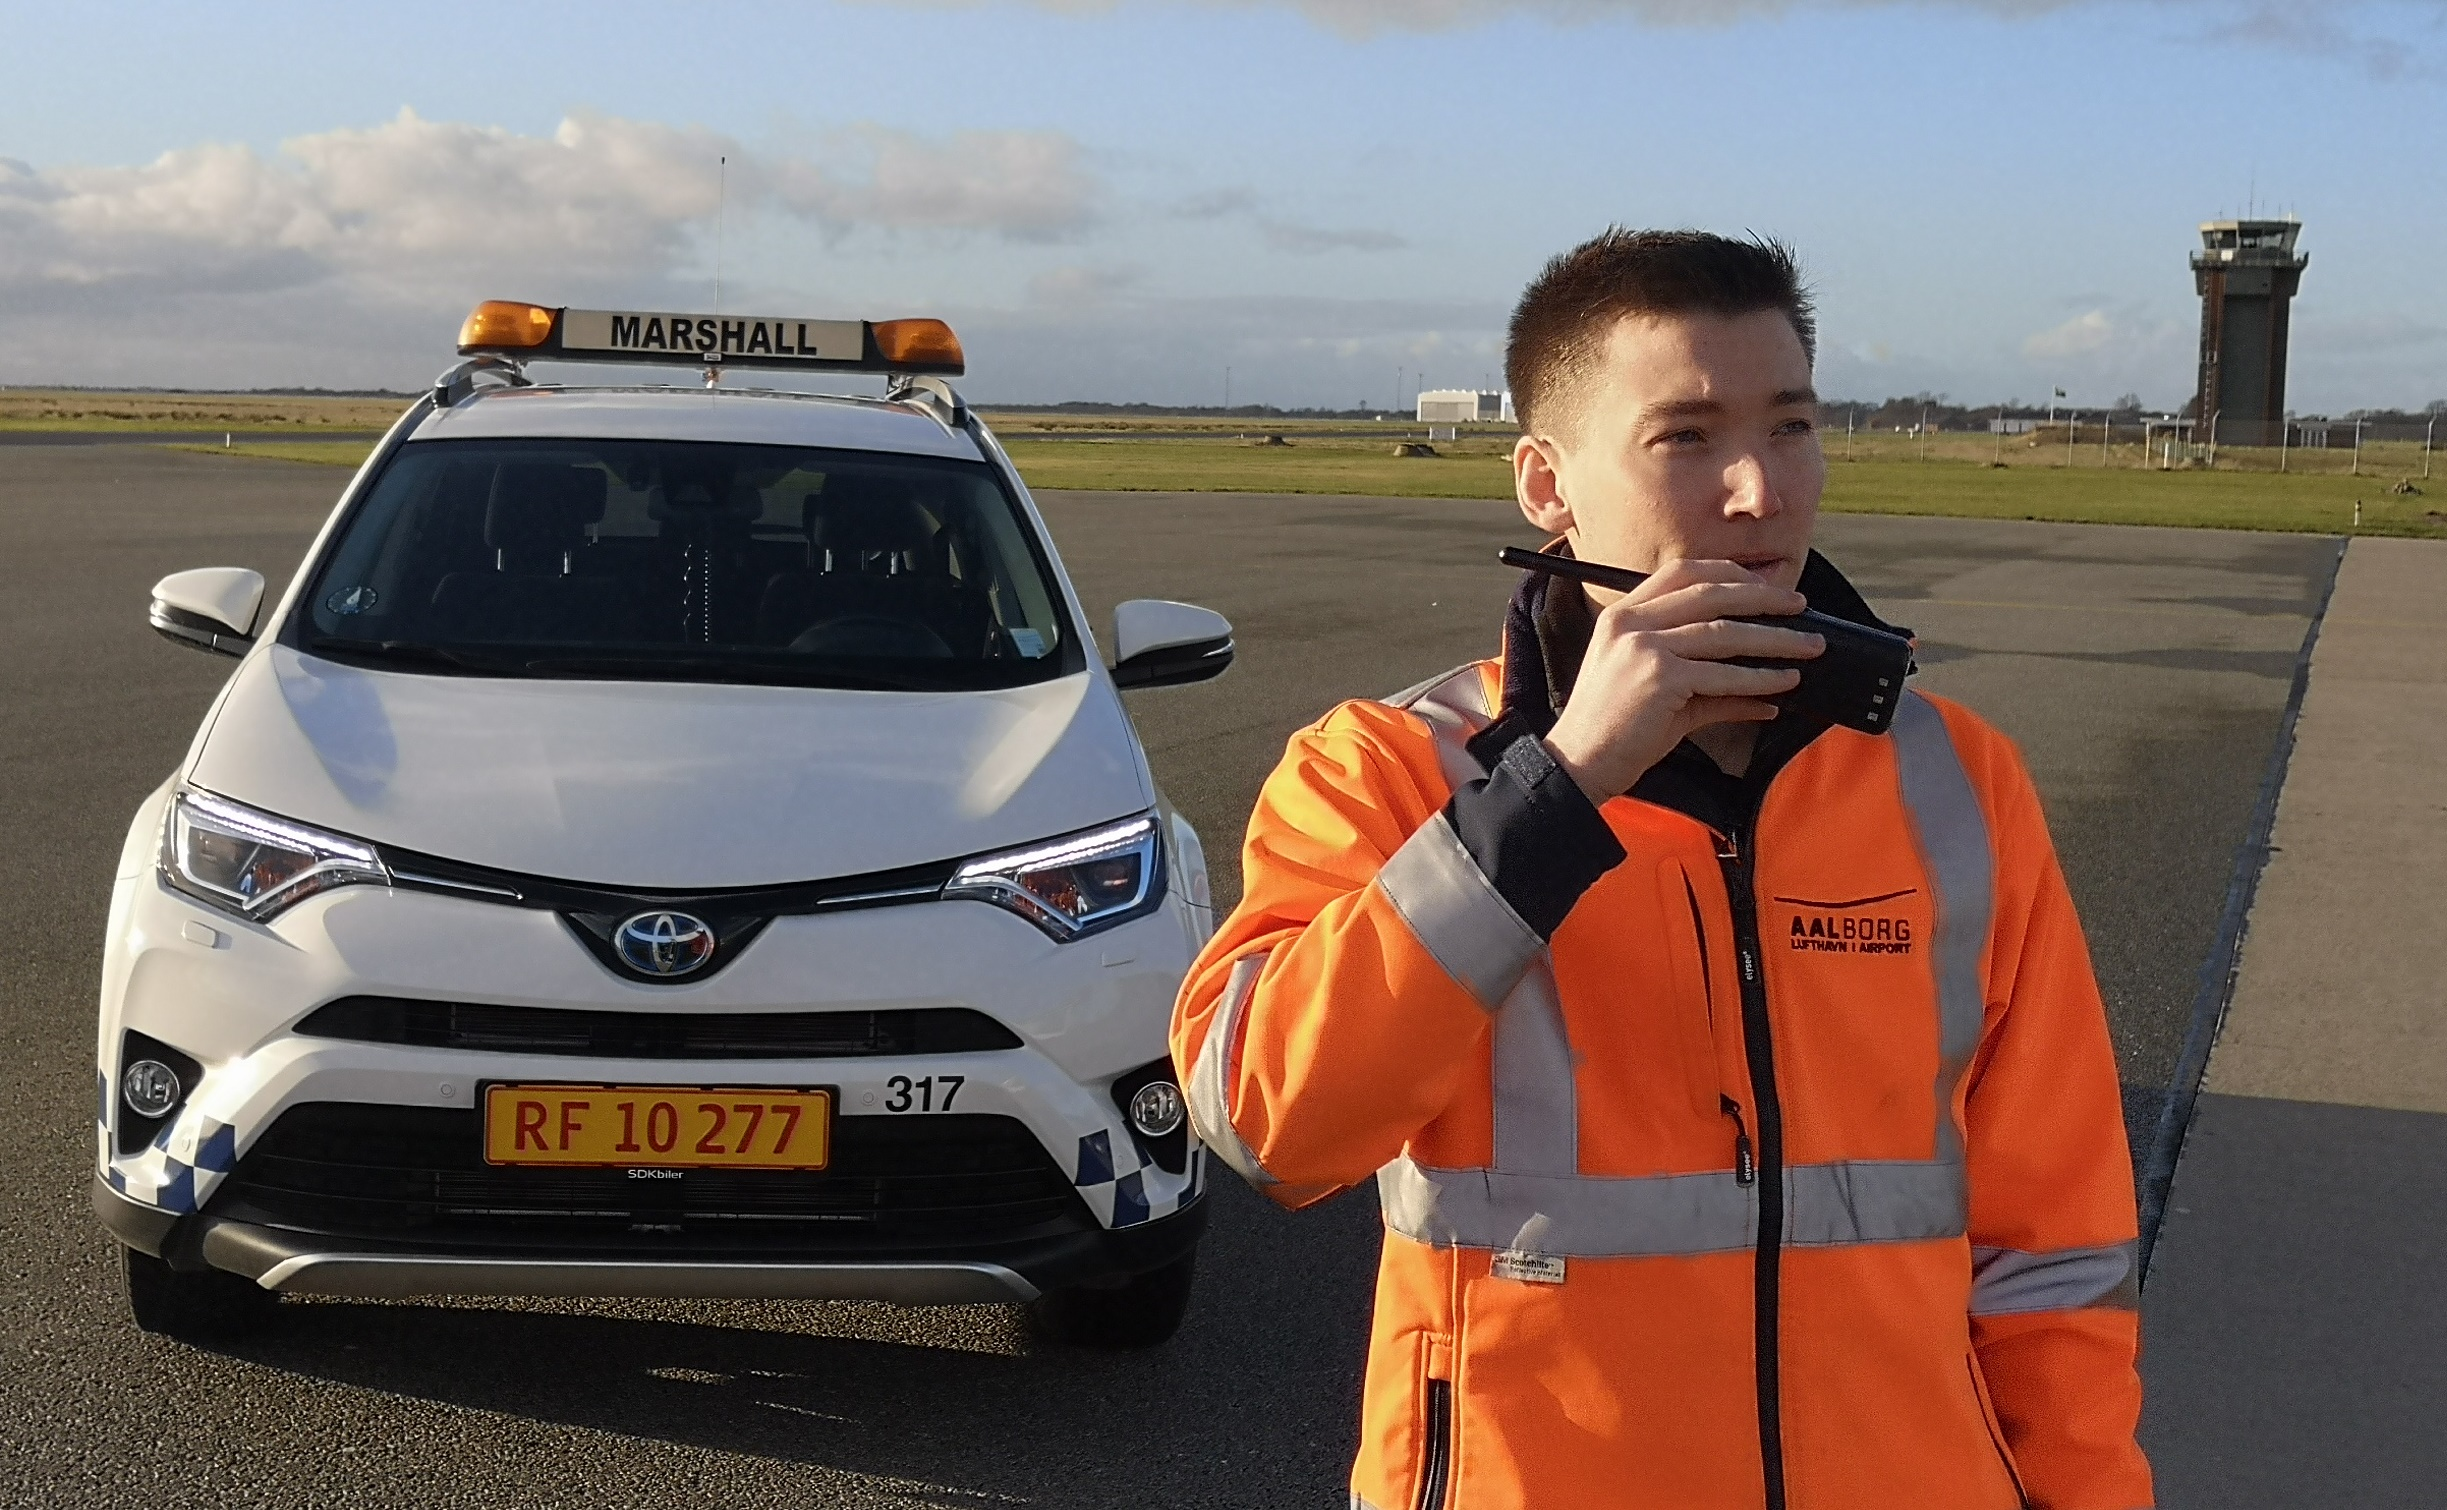 Philip Grandjean-Thomsen i sin rolle som marshall-assistent i Aalborg Lufthavn. (Privatfoto)